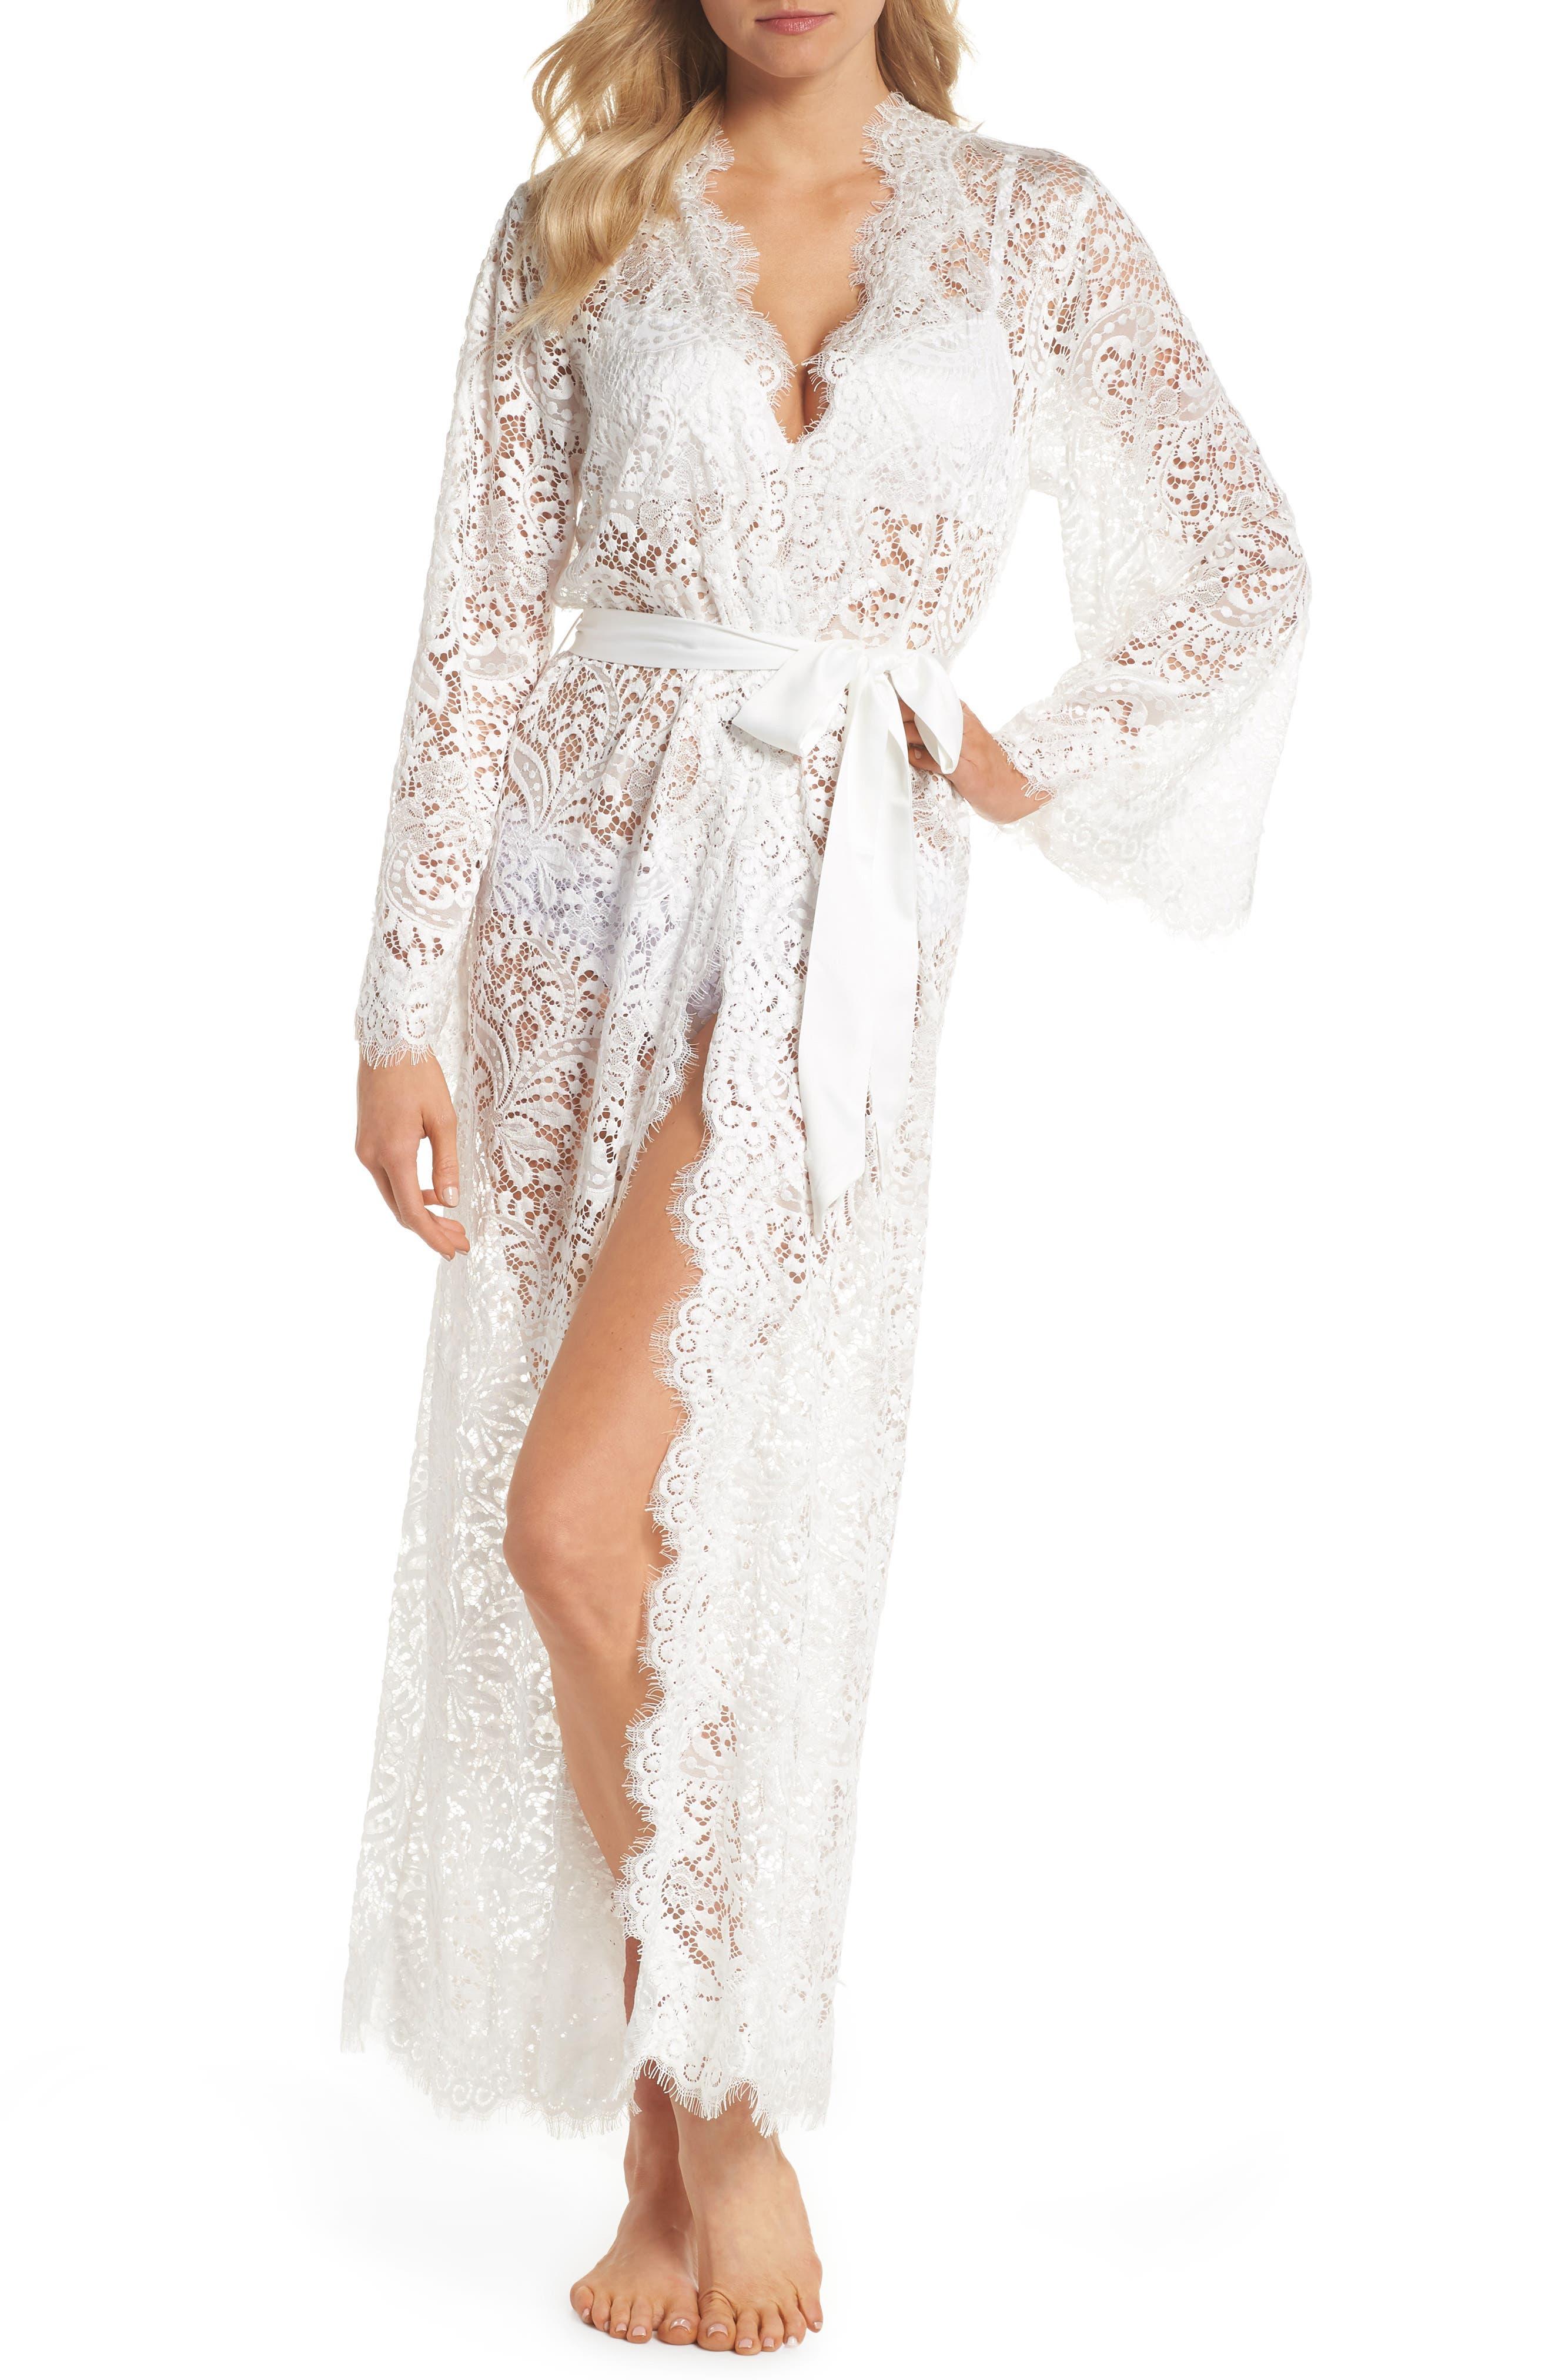 Anemone Long Lace Wrap,                             Main thumbnail 1, color,                             White